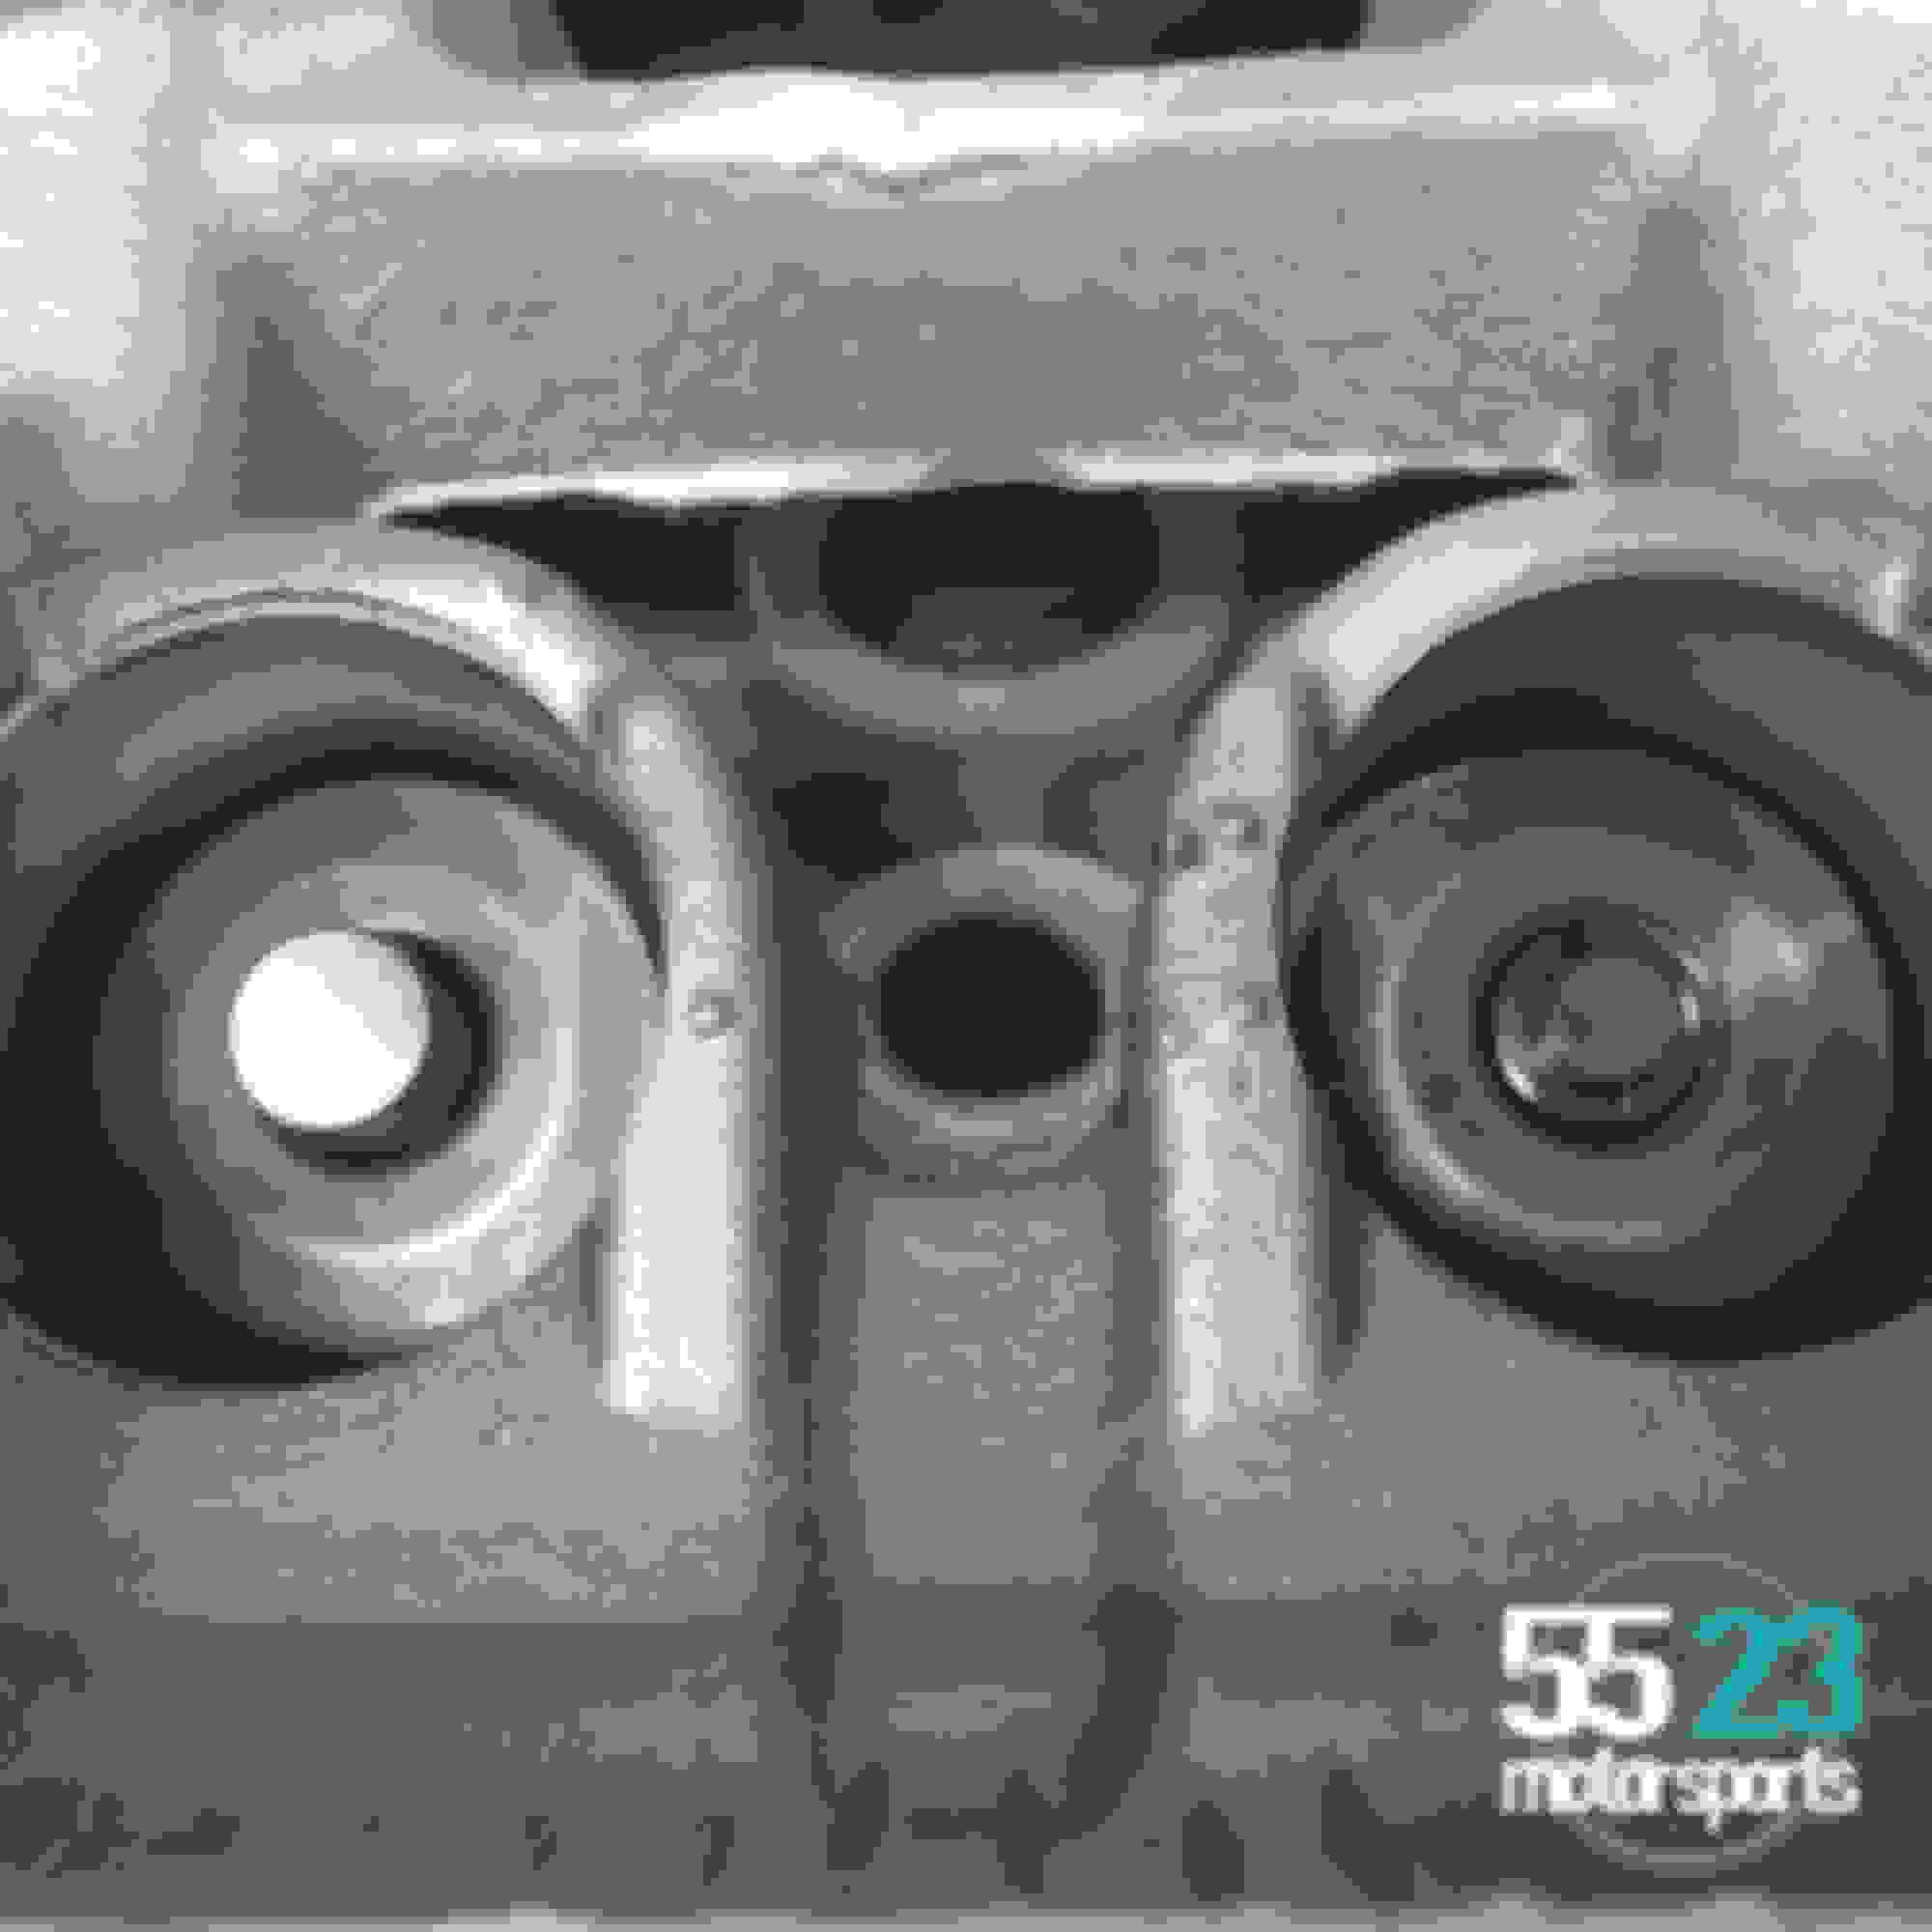 Engine building ideas - Miata Turbo Forum - Boost cars, acquire cats